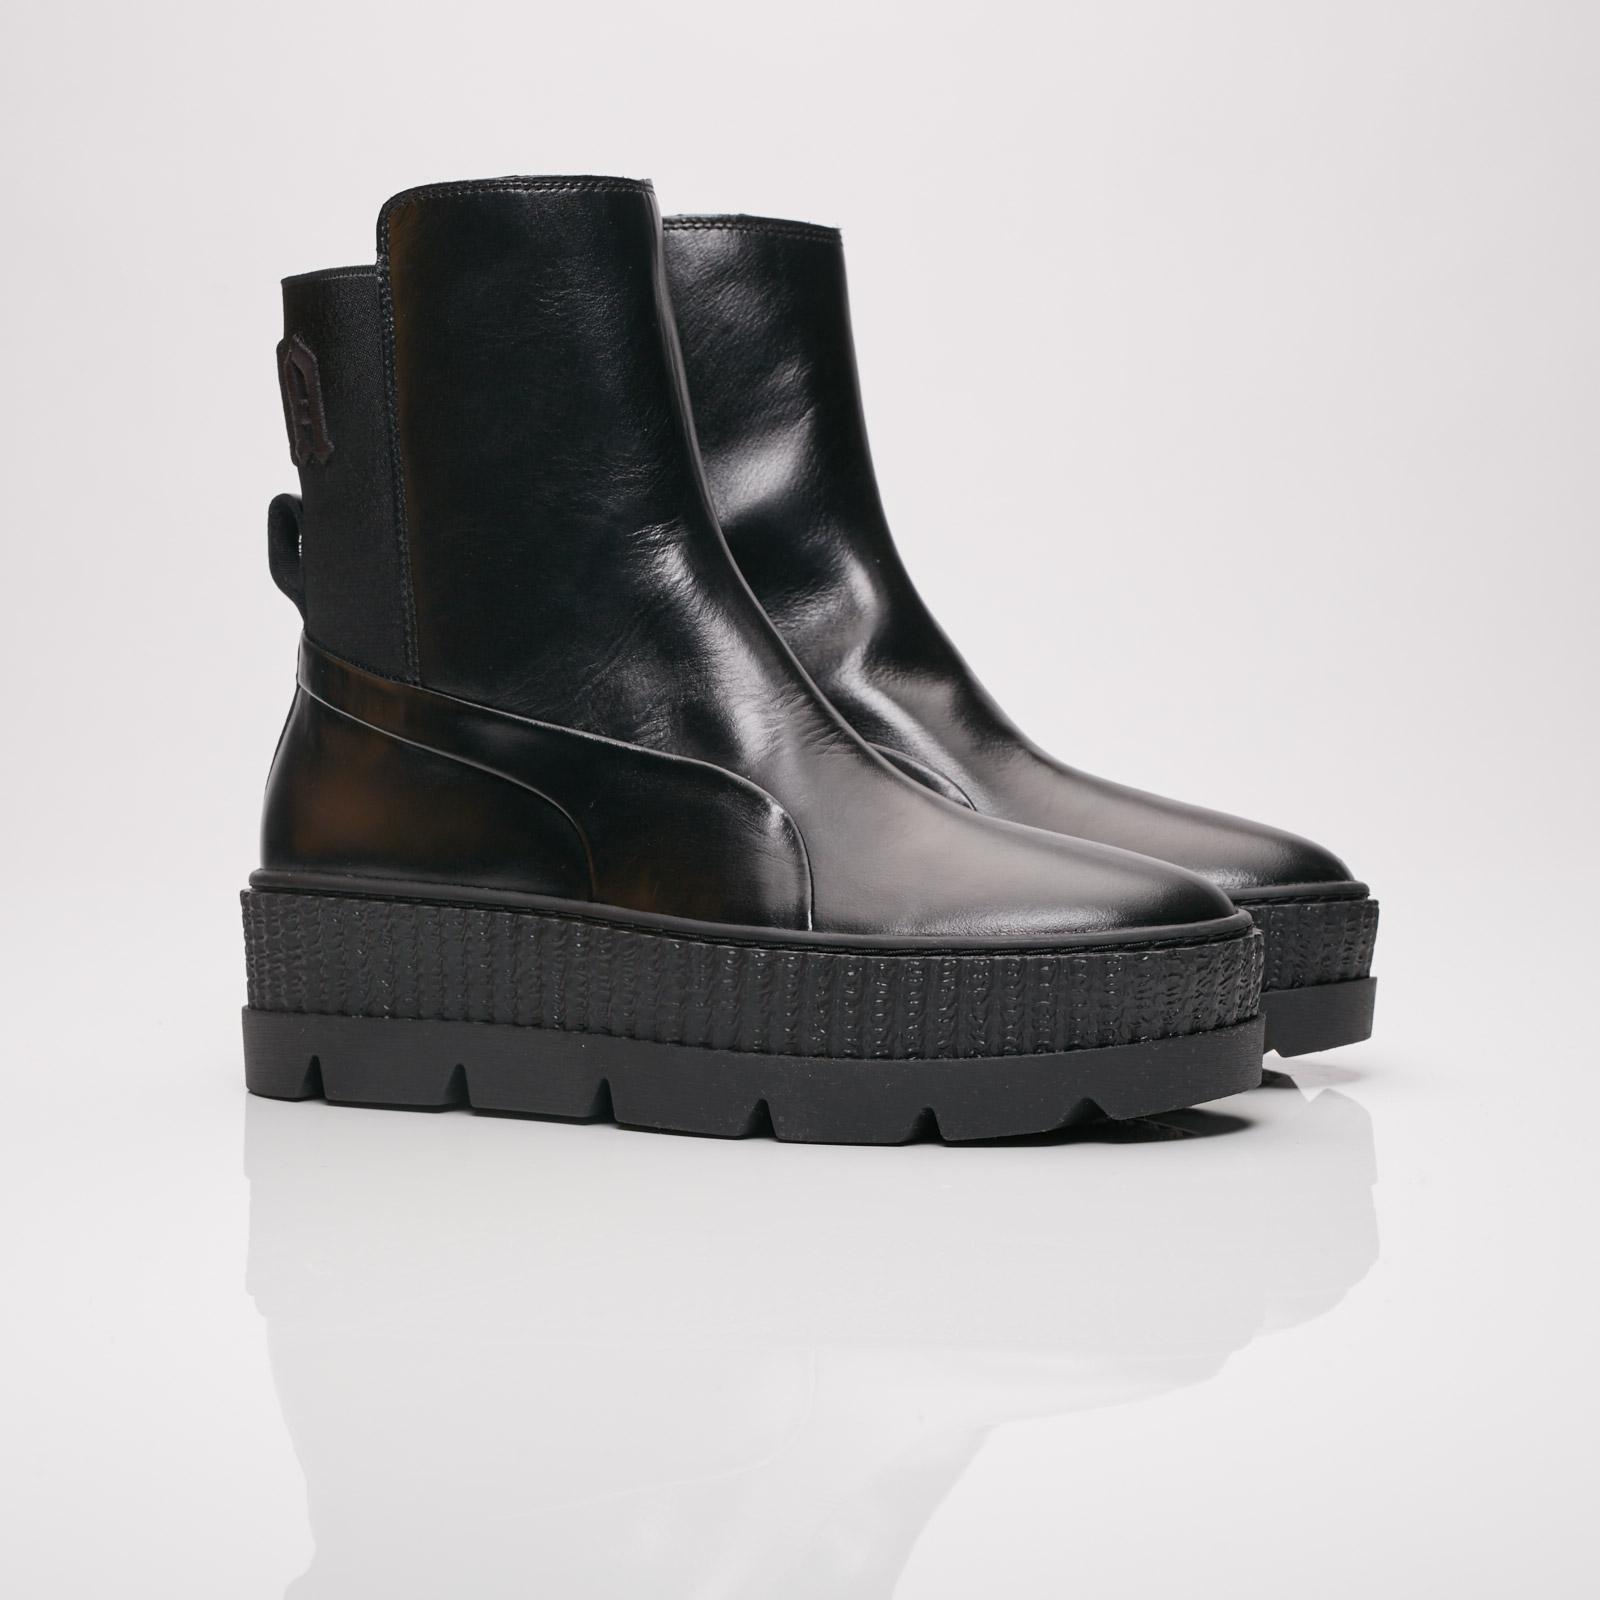 Puma Chelsea Sneaker Boot Wns - 366266-03 - Sneakersnstuff ... 2f91b4ae3